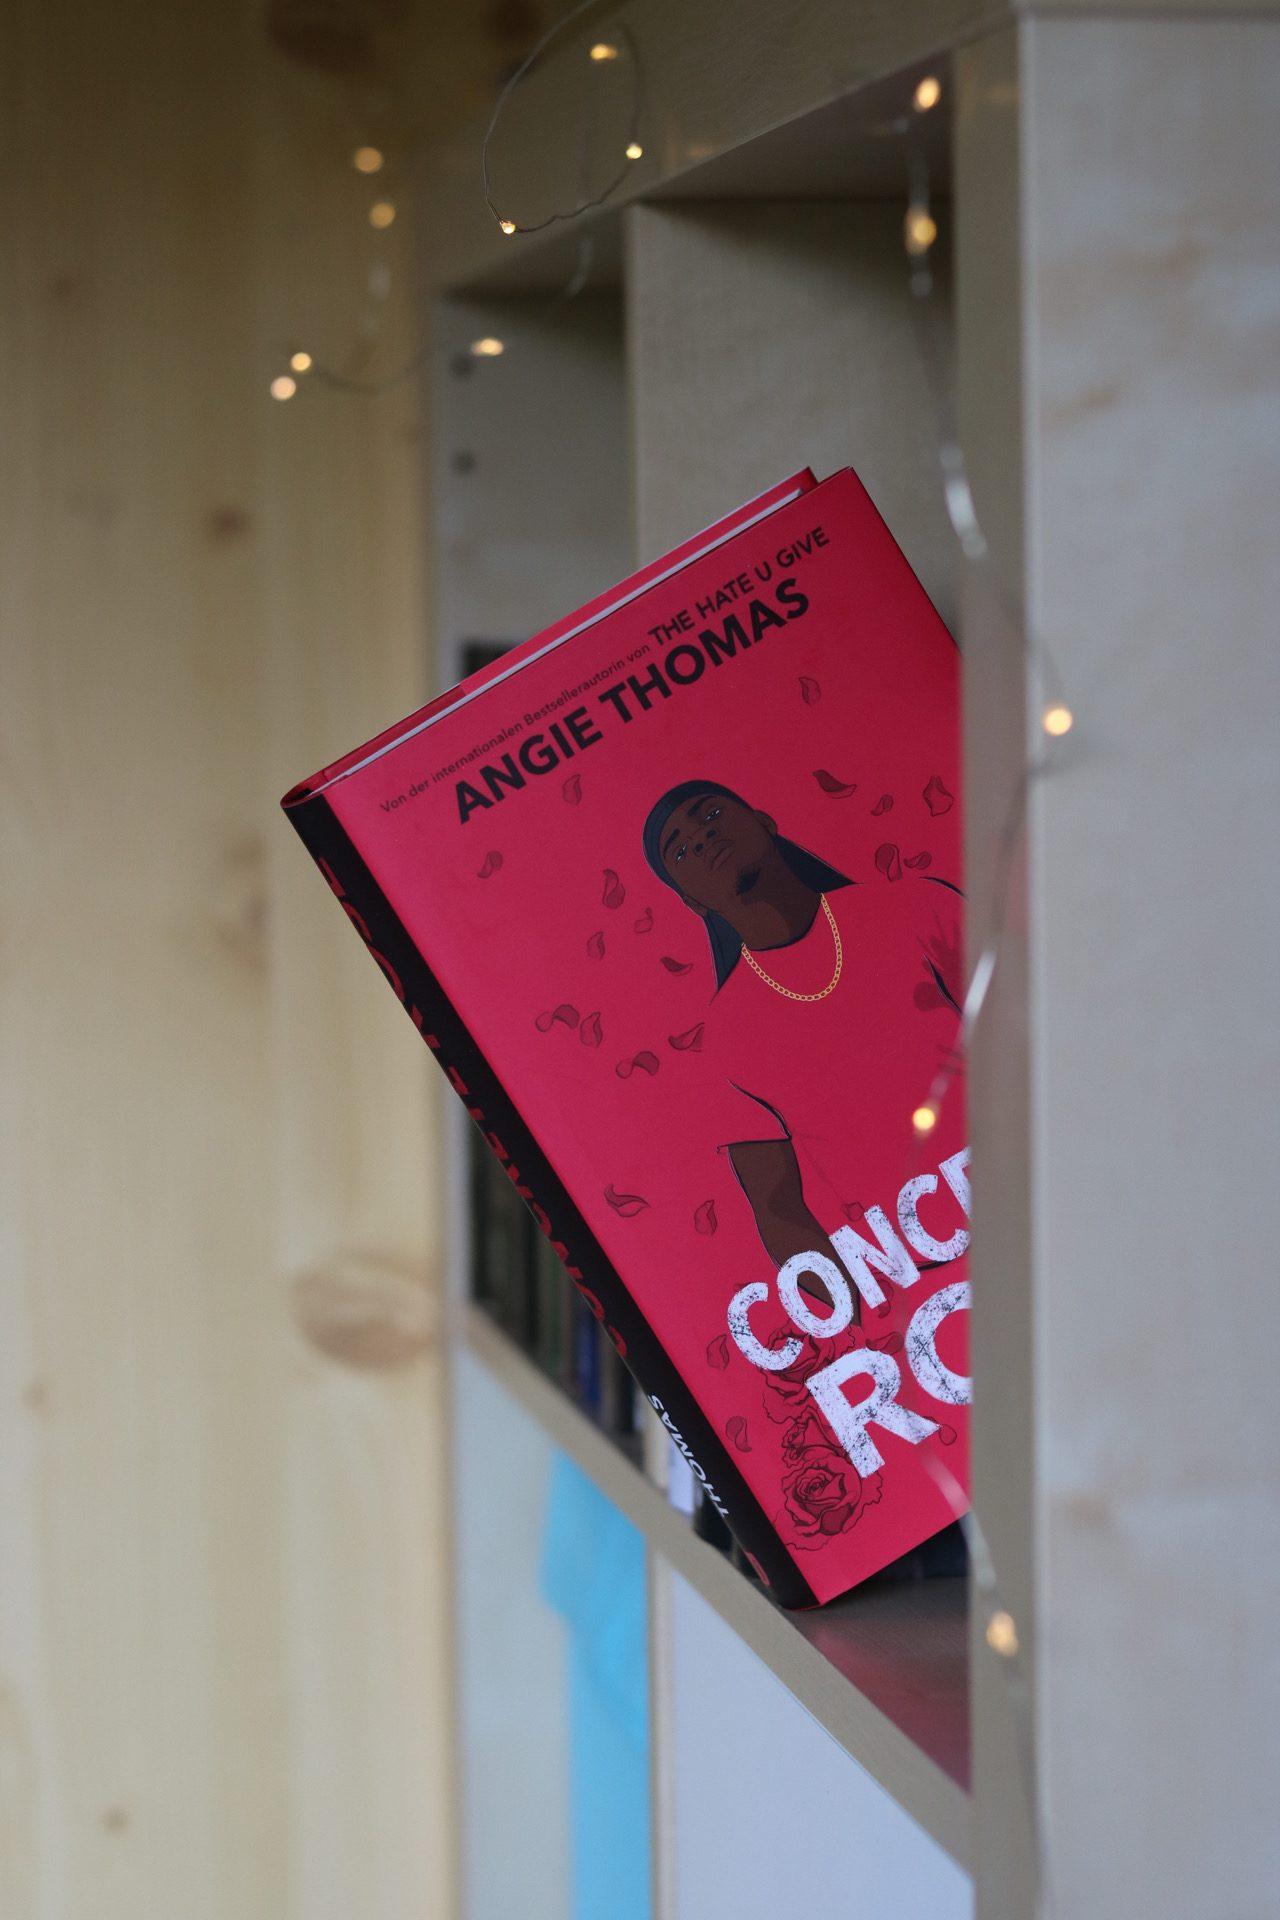 Concrete Rose | Angie Thomas